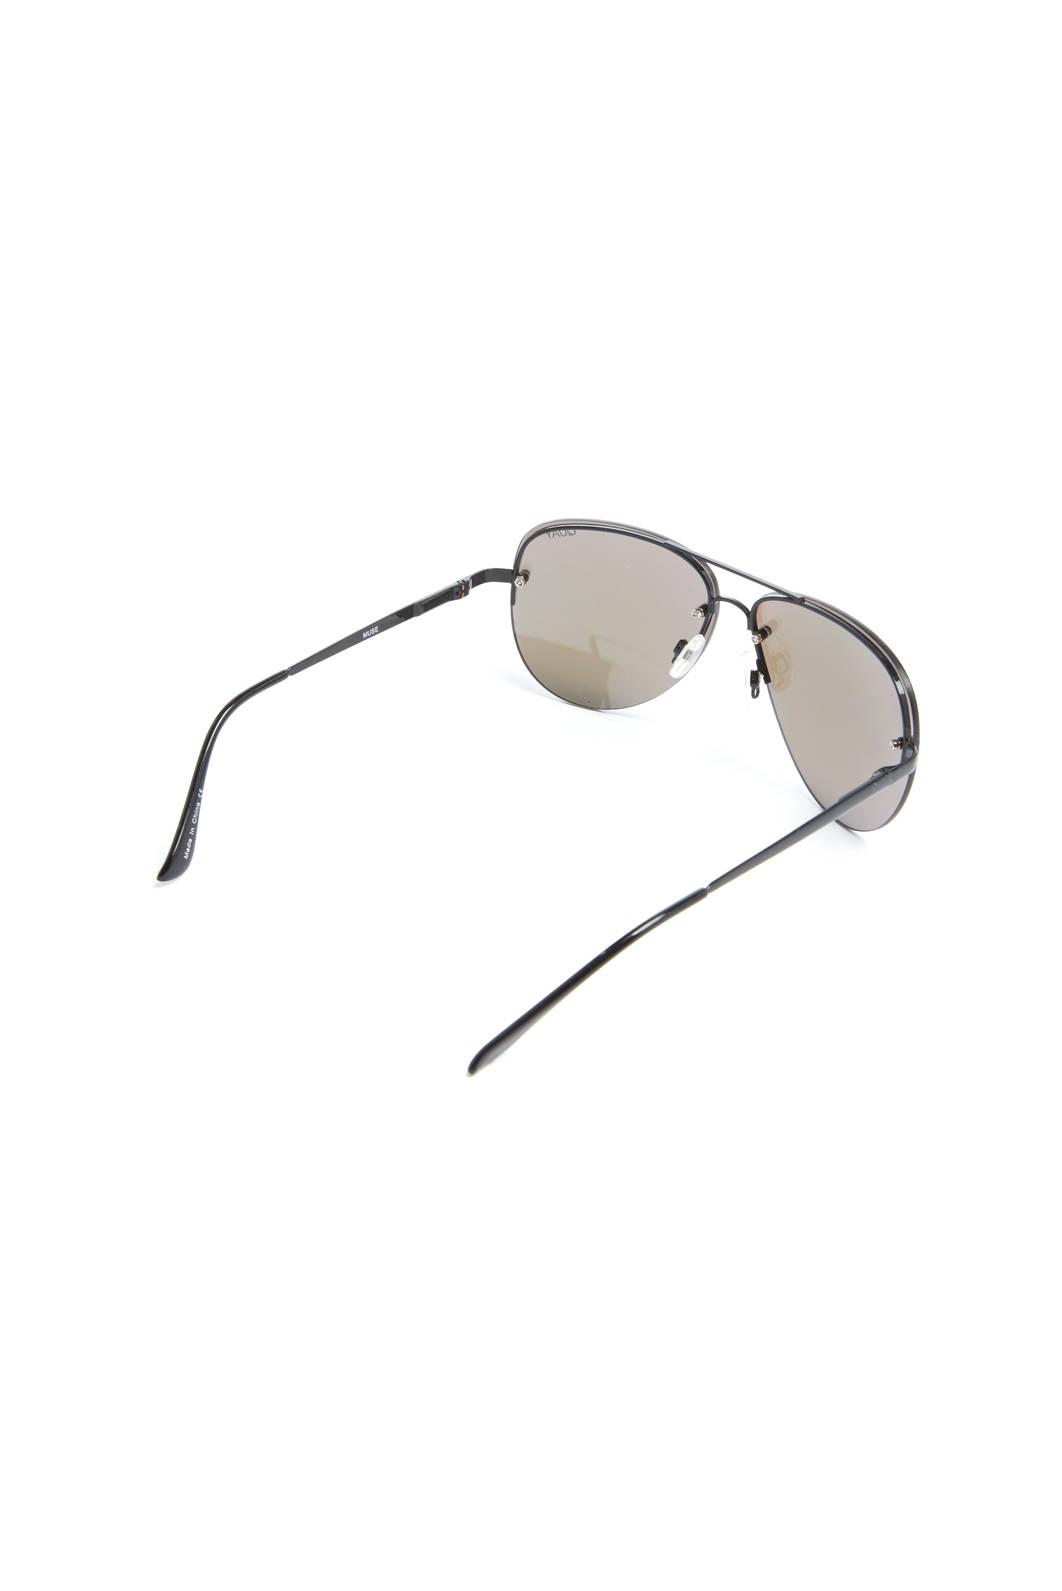 611f820211660 Lyst - Quay Muse Rimless Blue Flash Aviator Sunglasses in Purple for Men